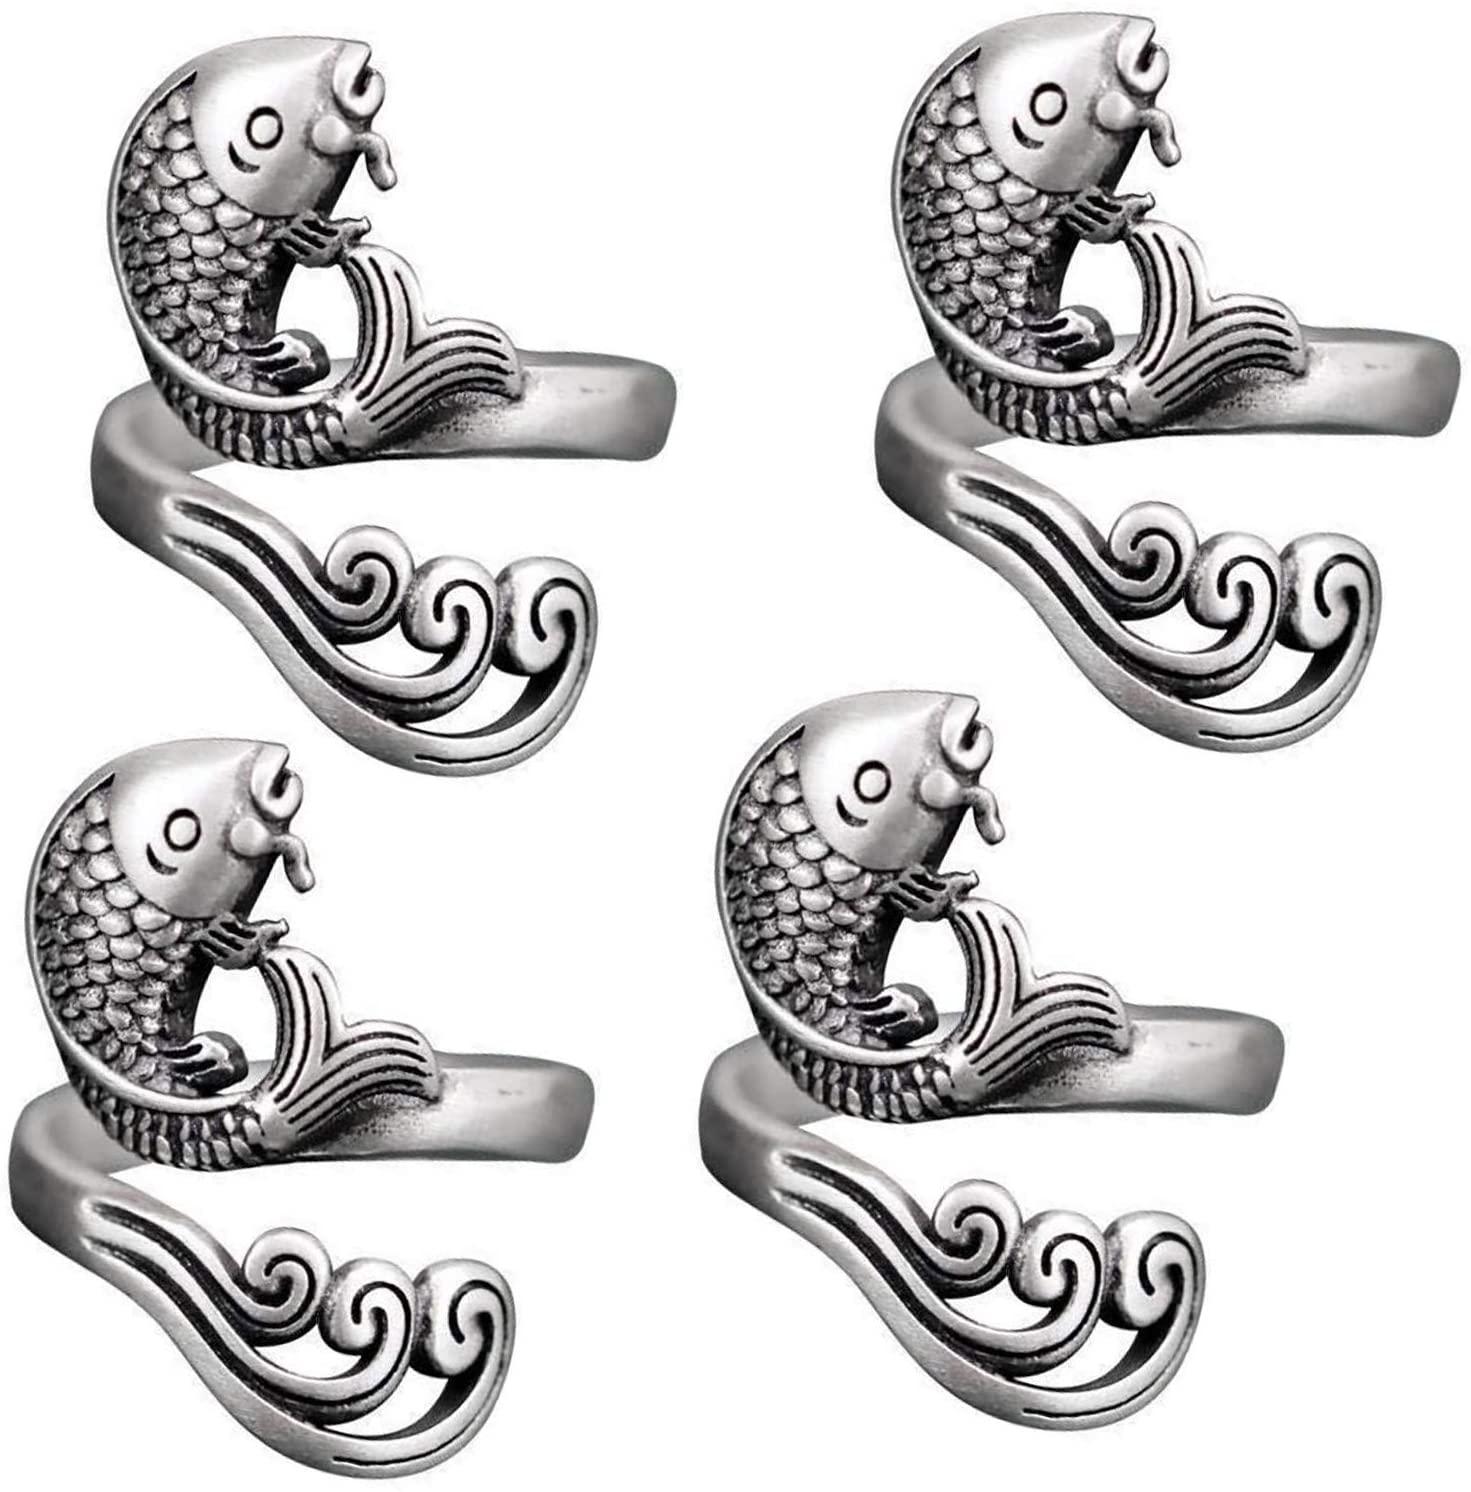 Adjustable Knitting Loop Crochet Ring Knitting Accessories, Peacock/Carp Open Finger Ring, Fashion Adjustable Braided Ring for Faster Knitting, Thimble Knitting Ring (Silver, 4PC)